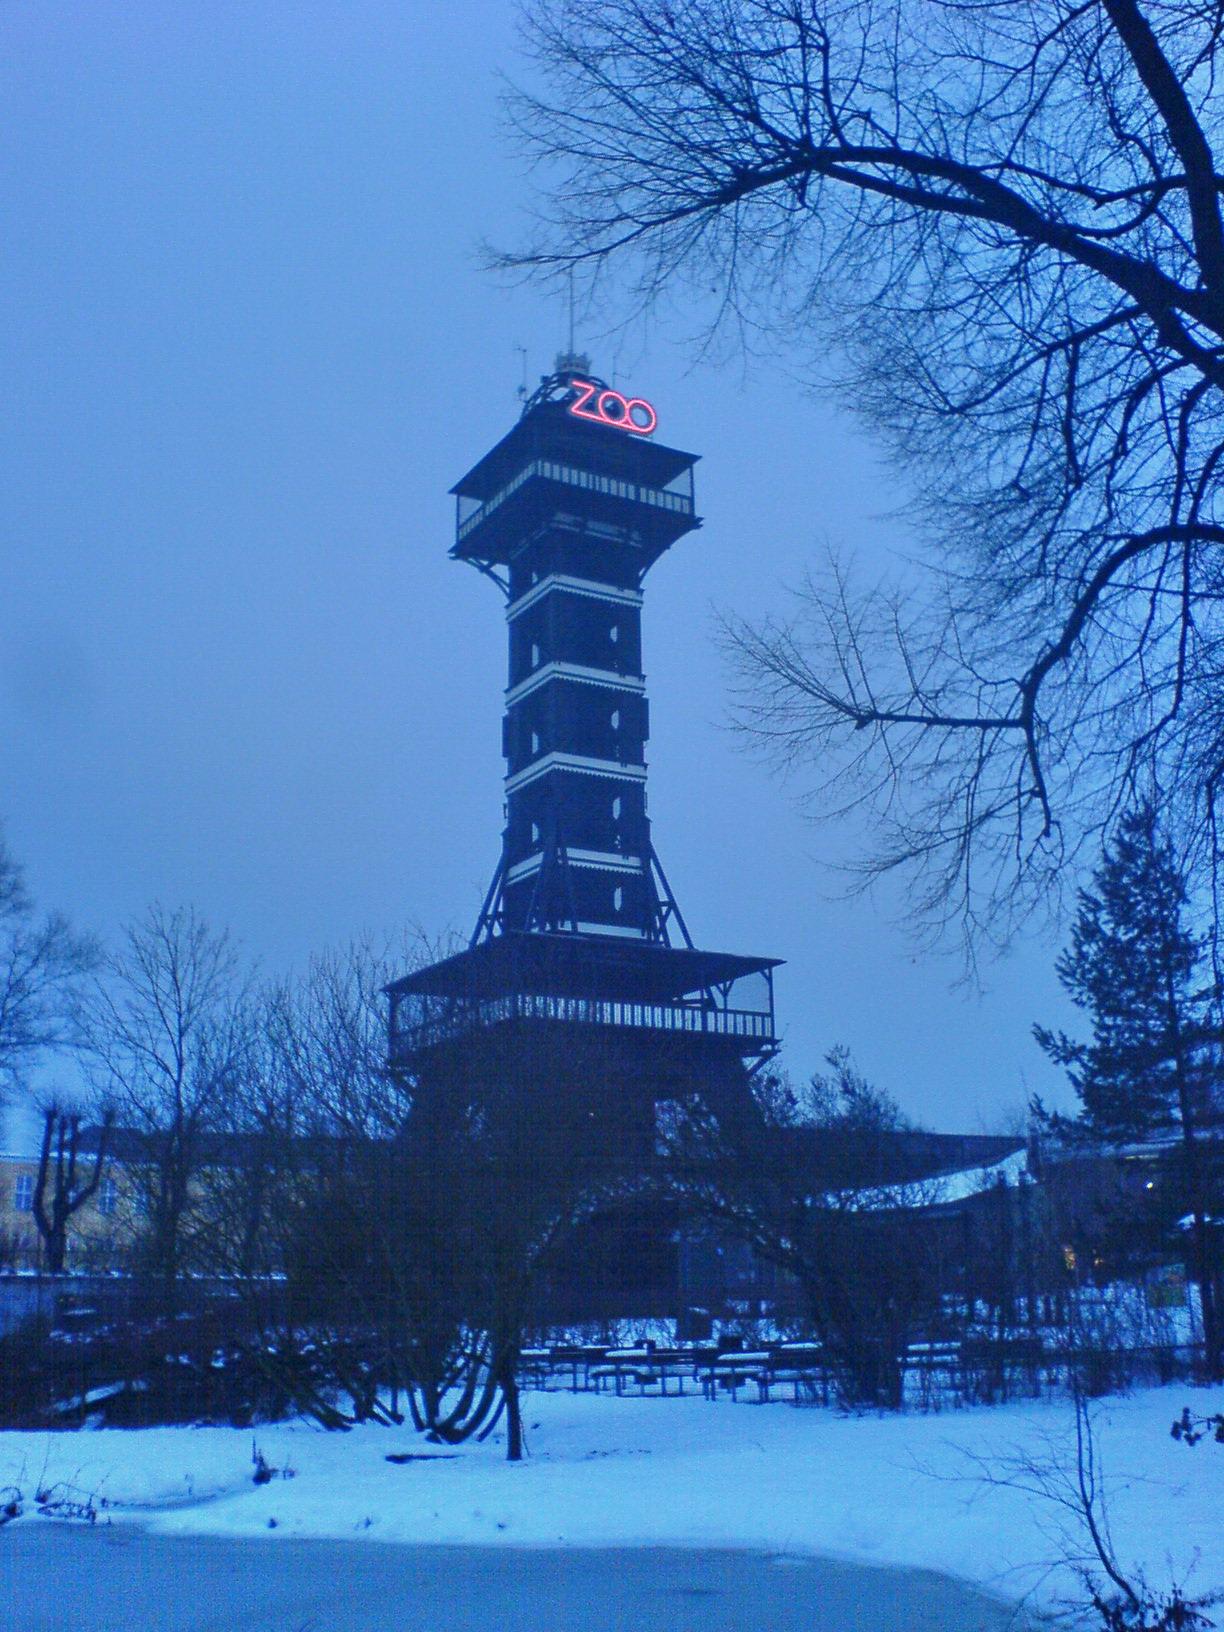 File Copenhagen Zoo Tower At Winter 80934811 Jpg Wikimedia Commons